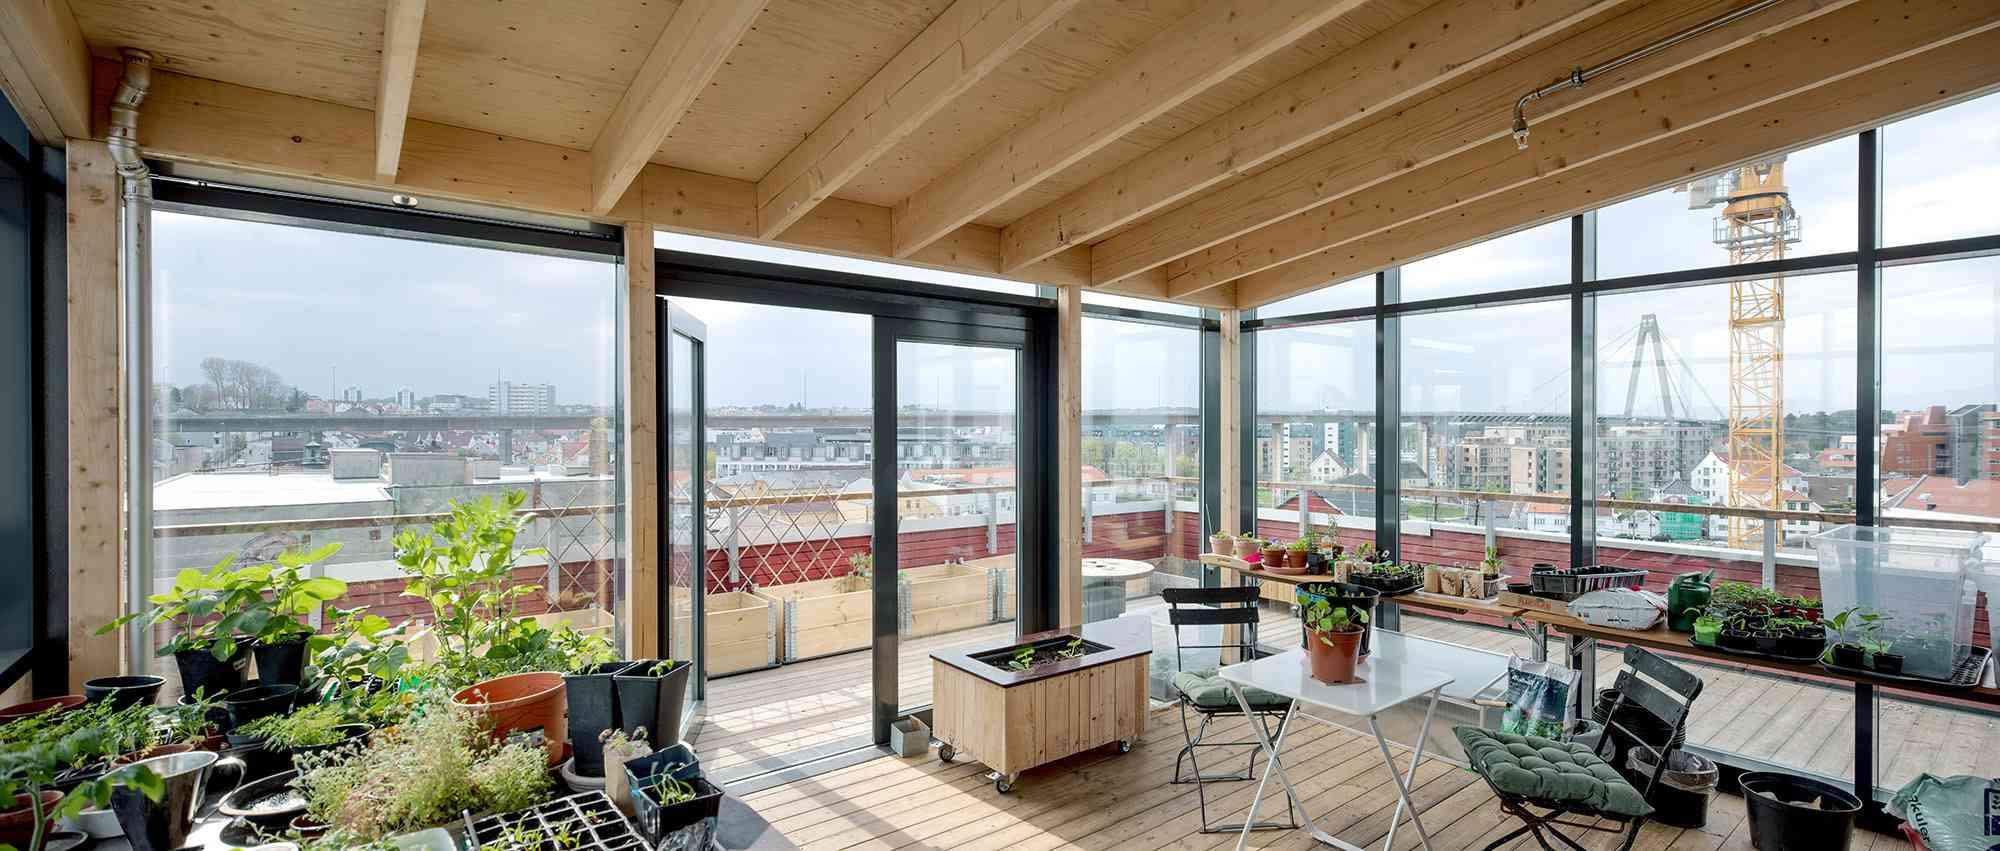 Vindmøllebakken Cohousing Project by Helen & Hard Architects greenhouse